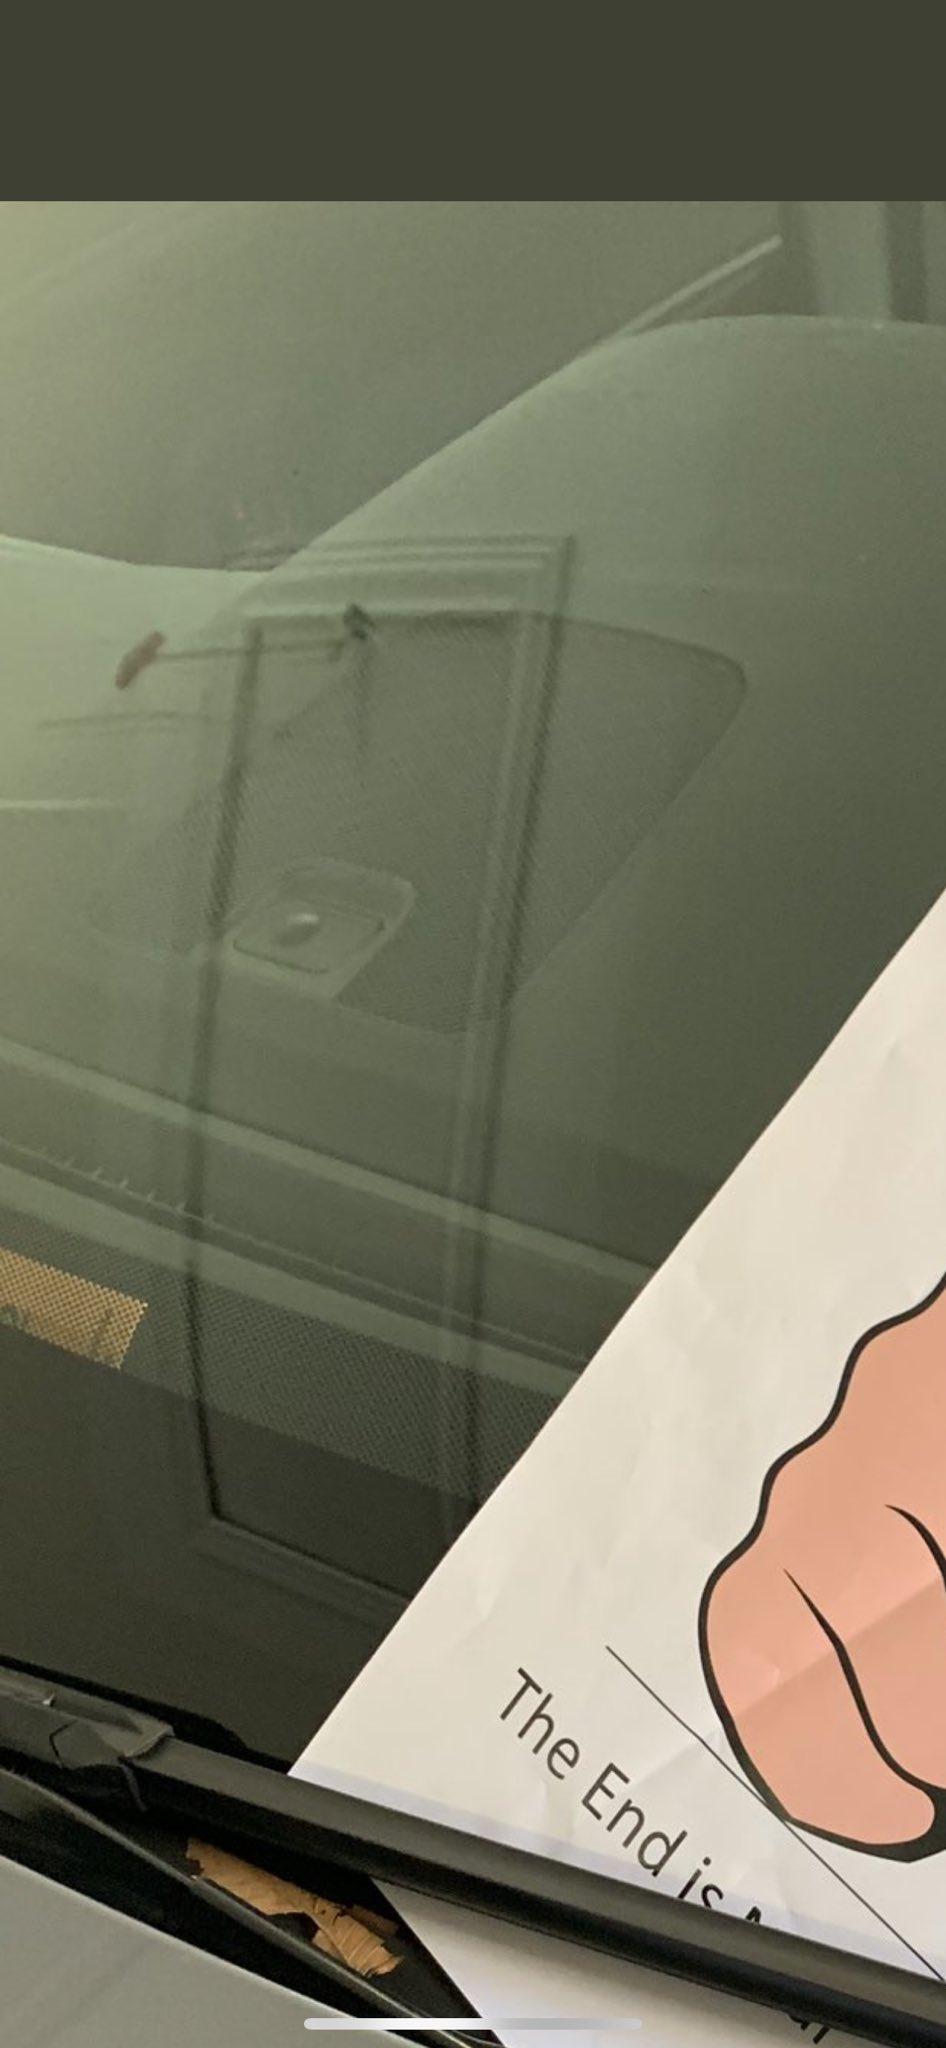 sakran25 ANTI-GUN DOCTOR ACCUSED OF SENDING HIMSELF DEATH THREAT [your]NEWS